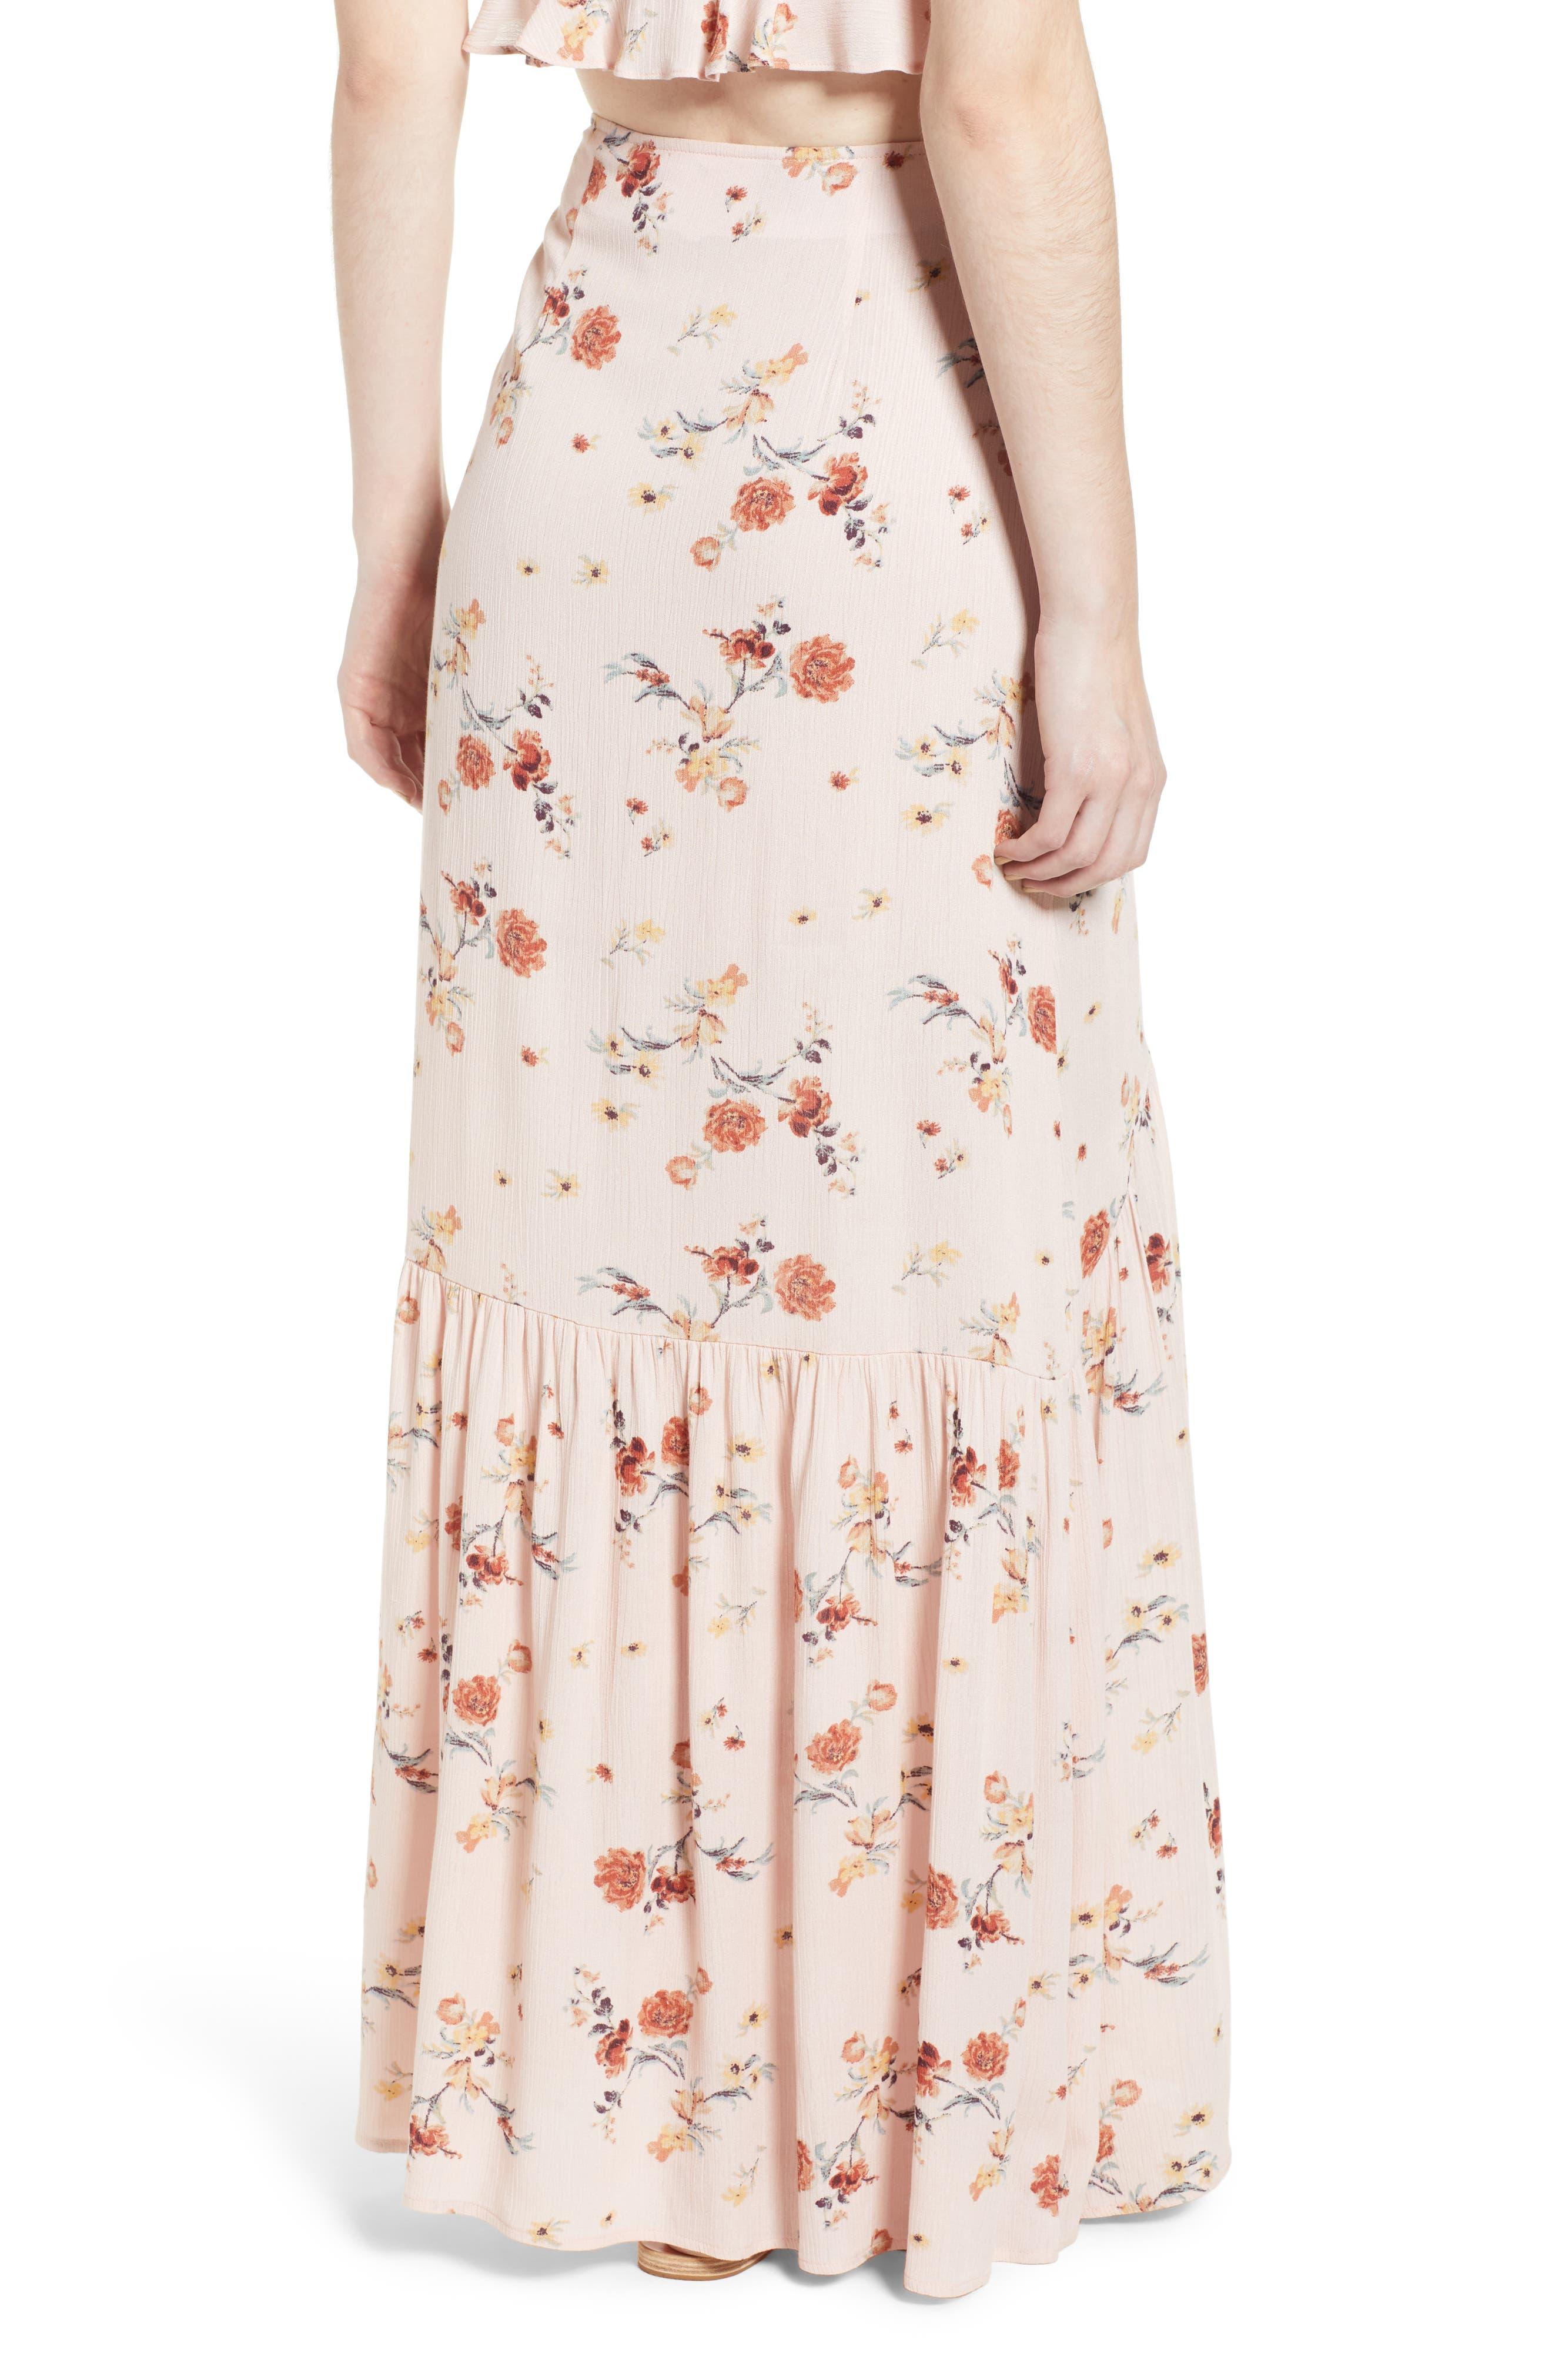 Rosa Floral Maxi Skirt,                             Alternate thumbnail 3, color,                             Pink Floral